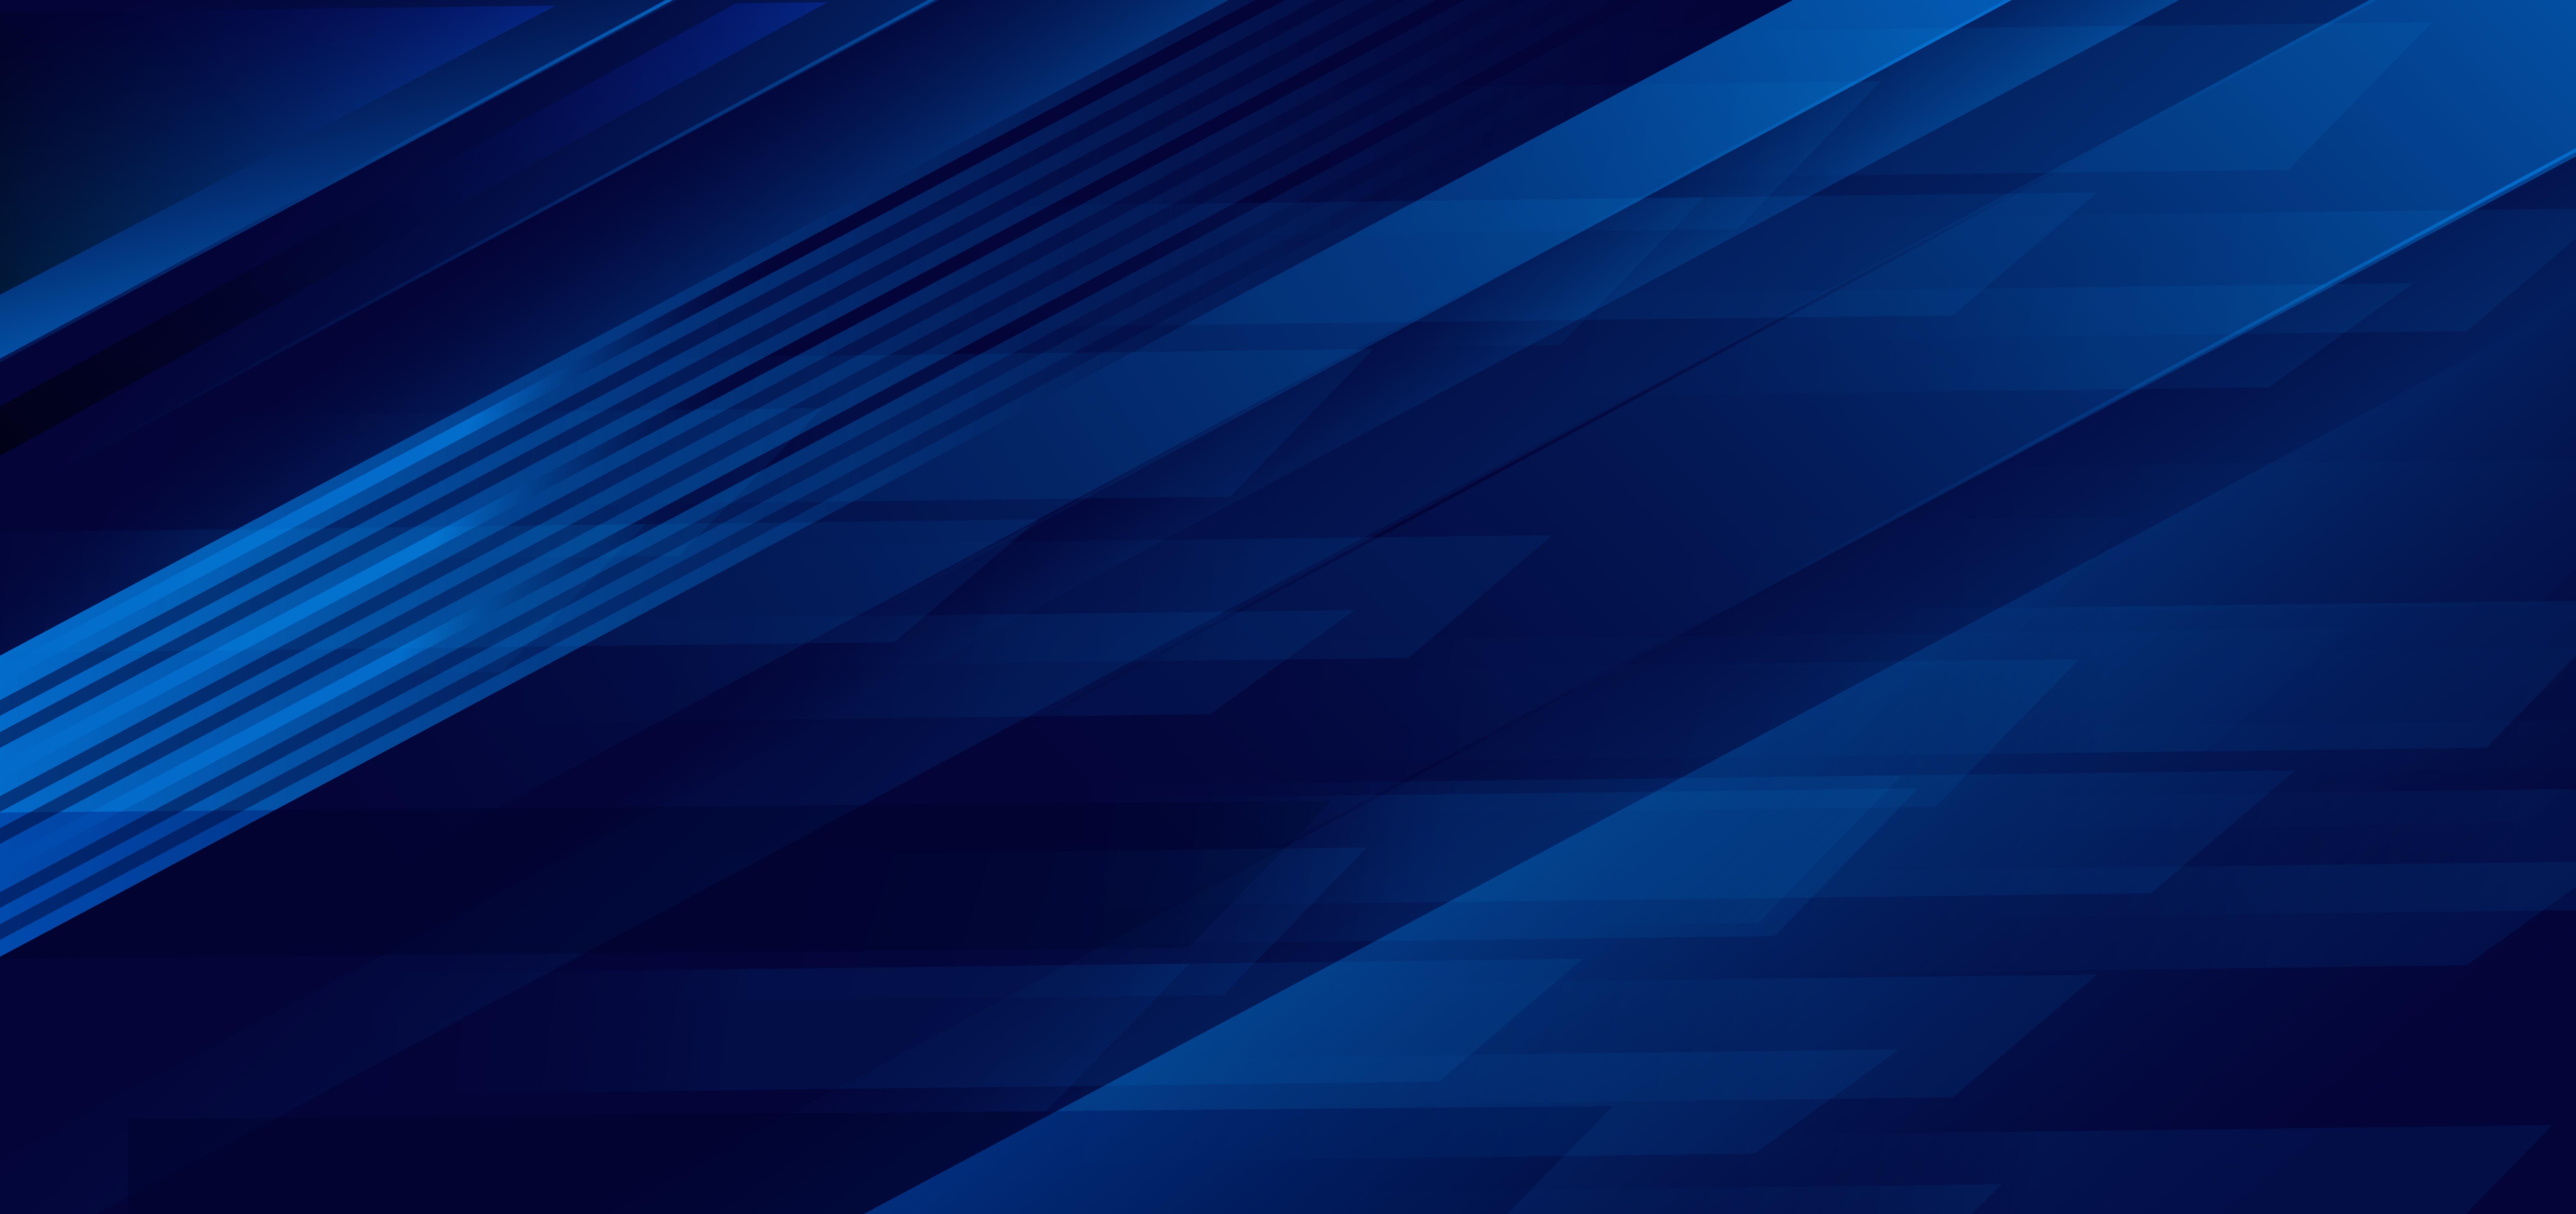 Dark Blue Stripes Geometric Overlapping Background 1632448 Vector Art At  Vecteezy